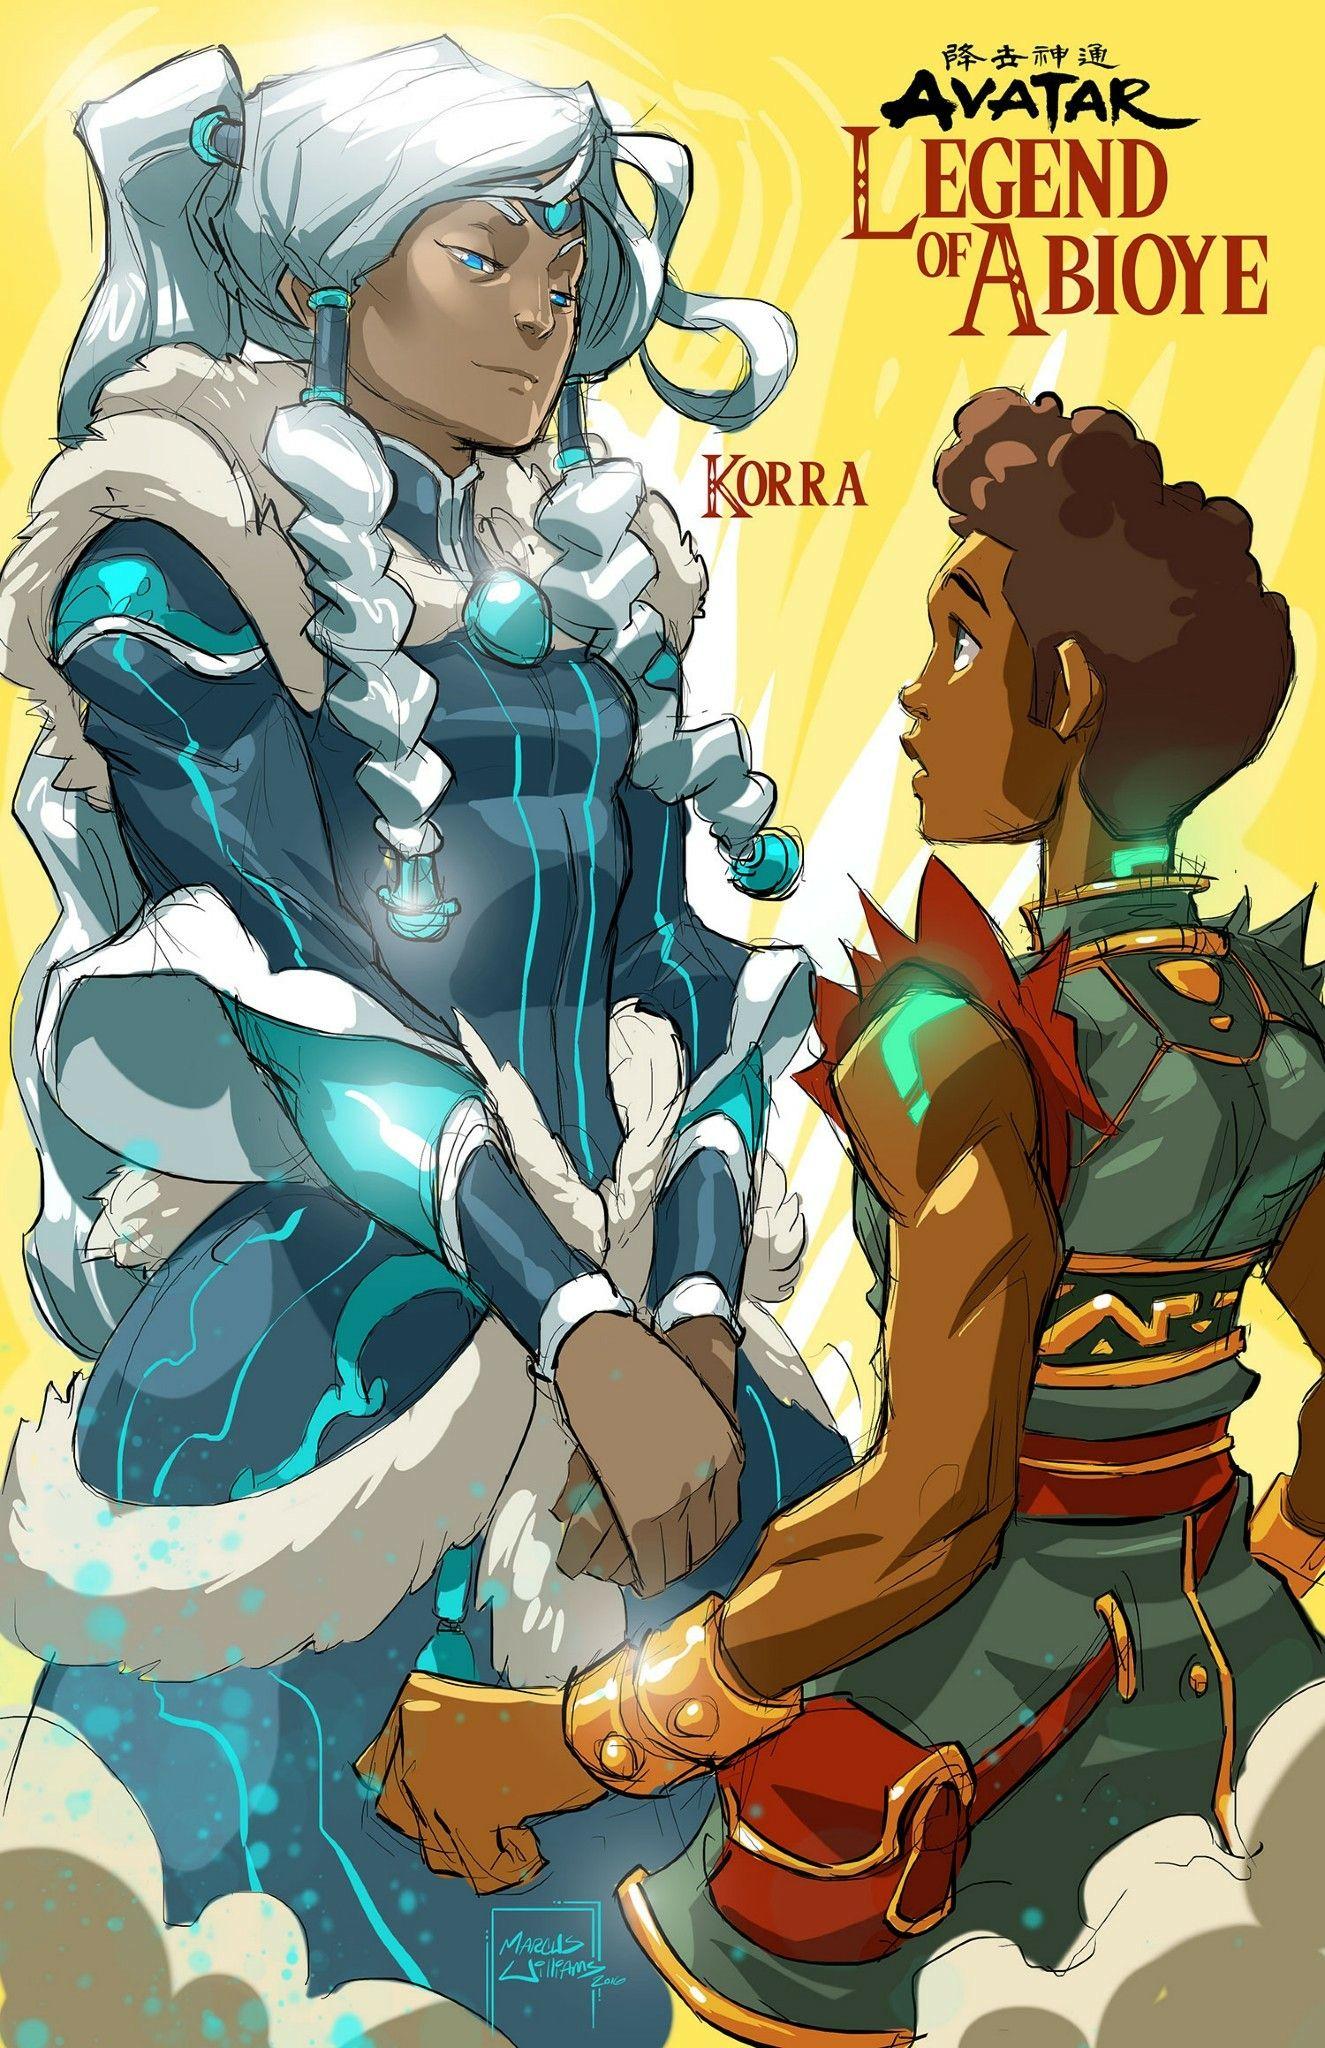 Abioye meets korra black anime characters avatar